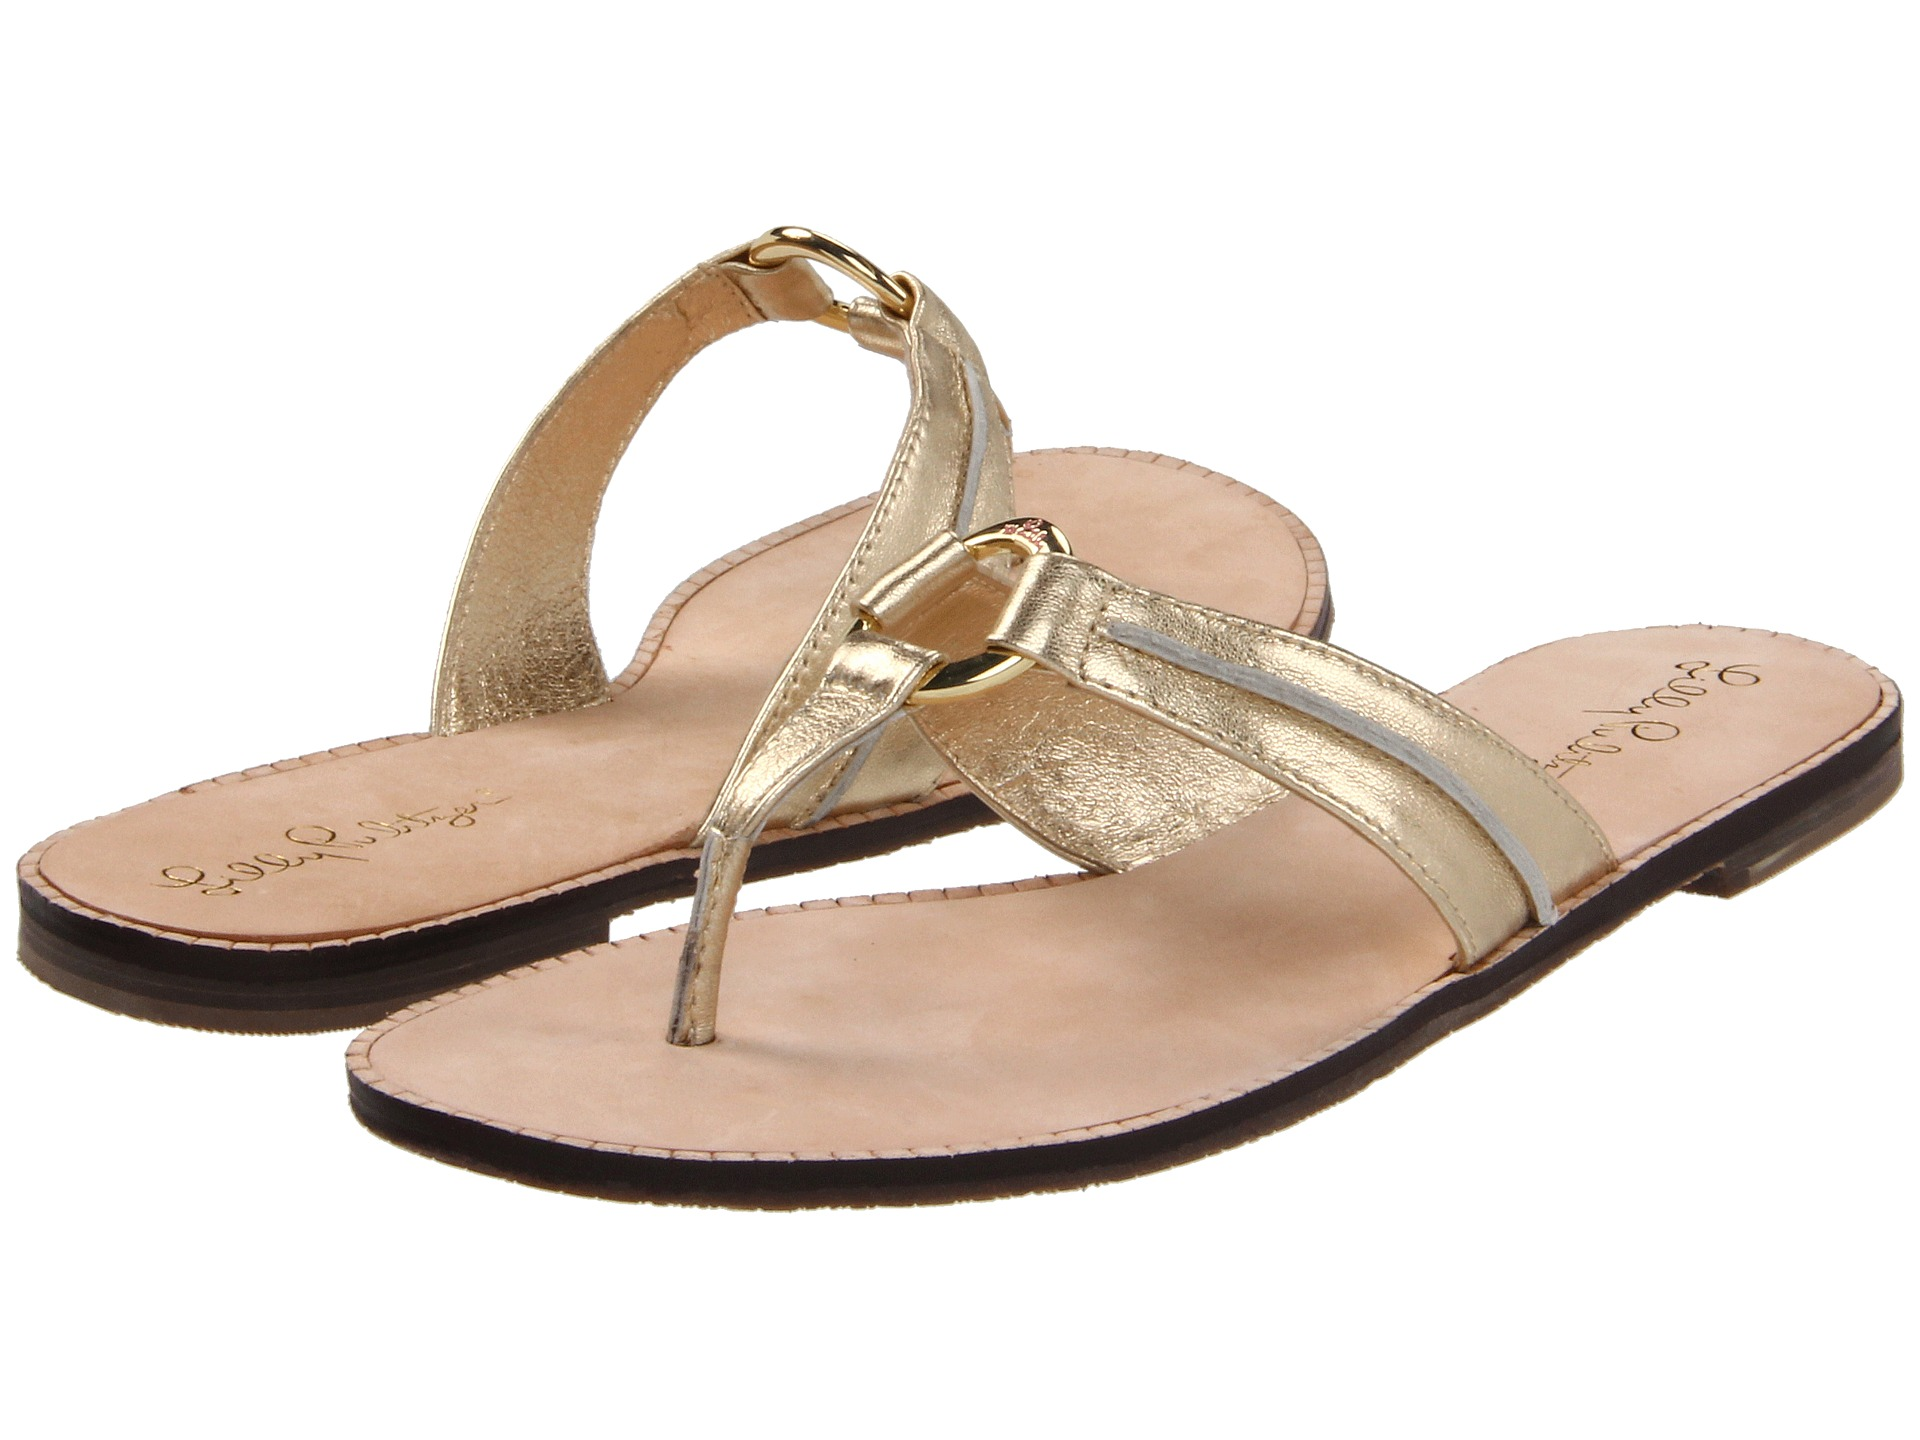 Measurements For Women S Shoes Size S